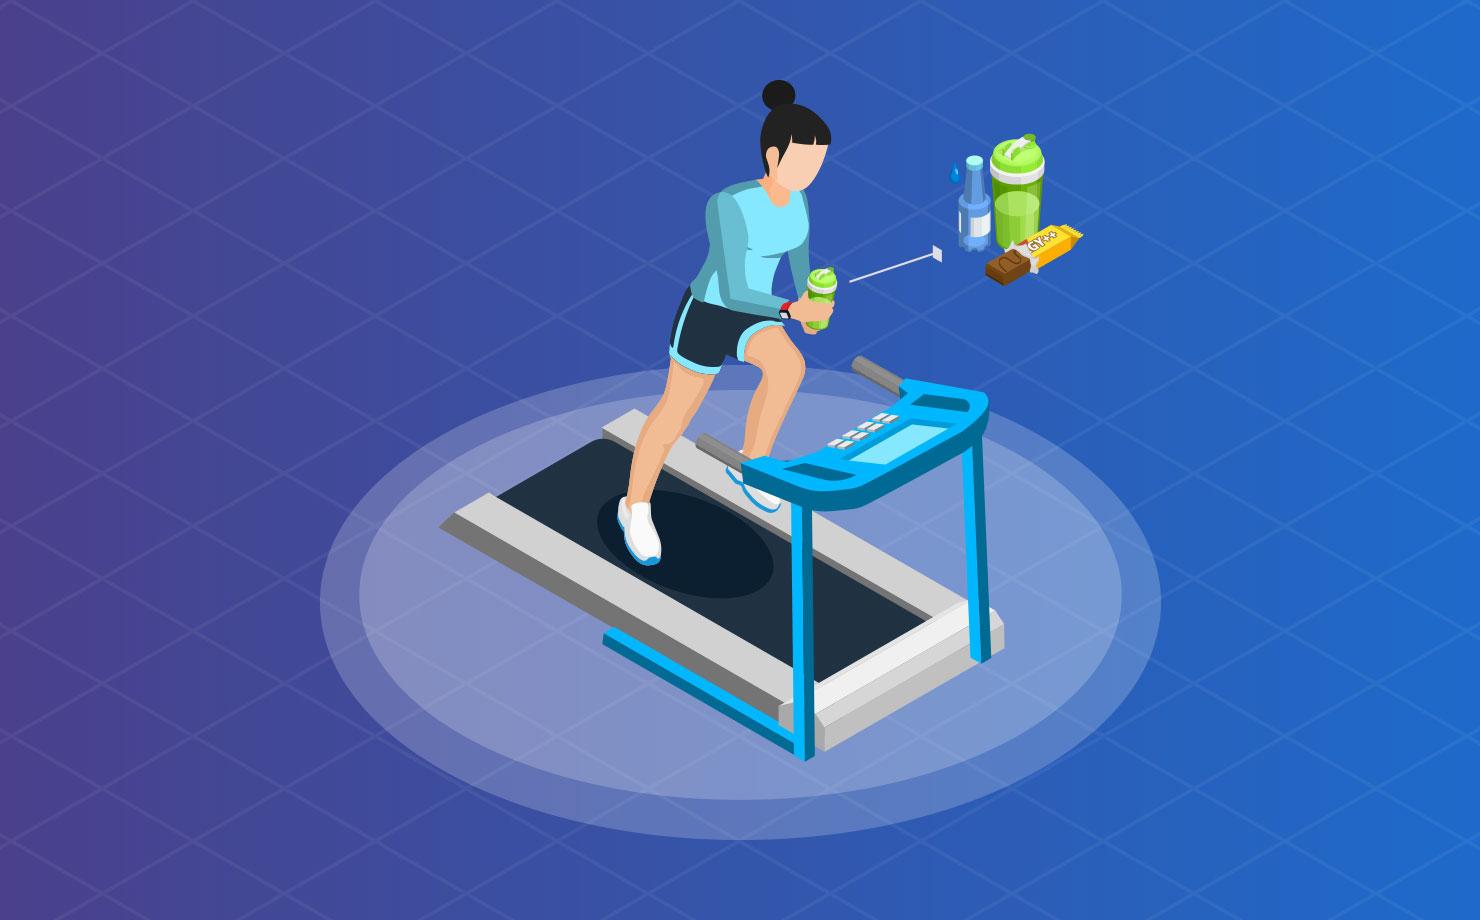 Sports and fitness app development